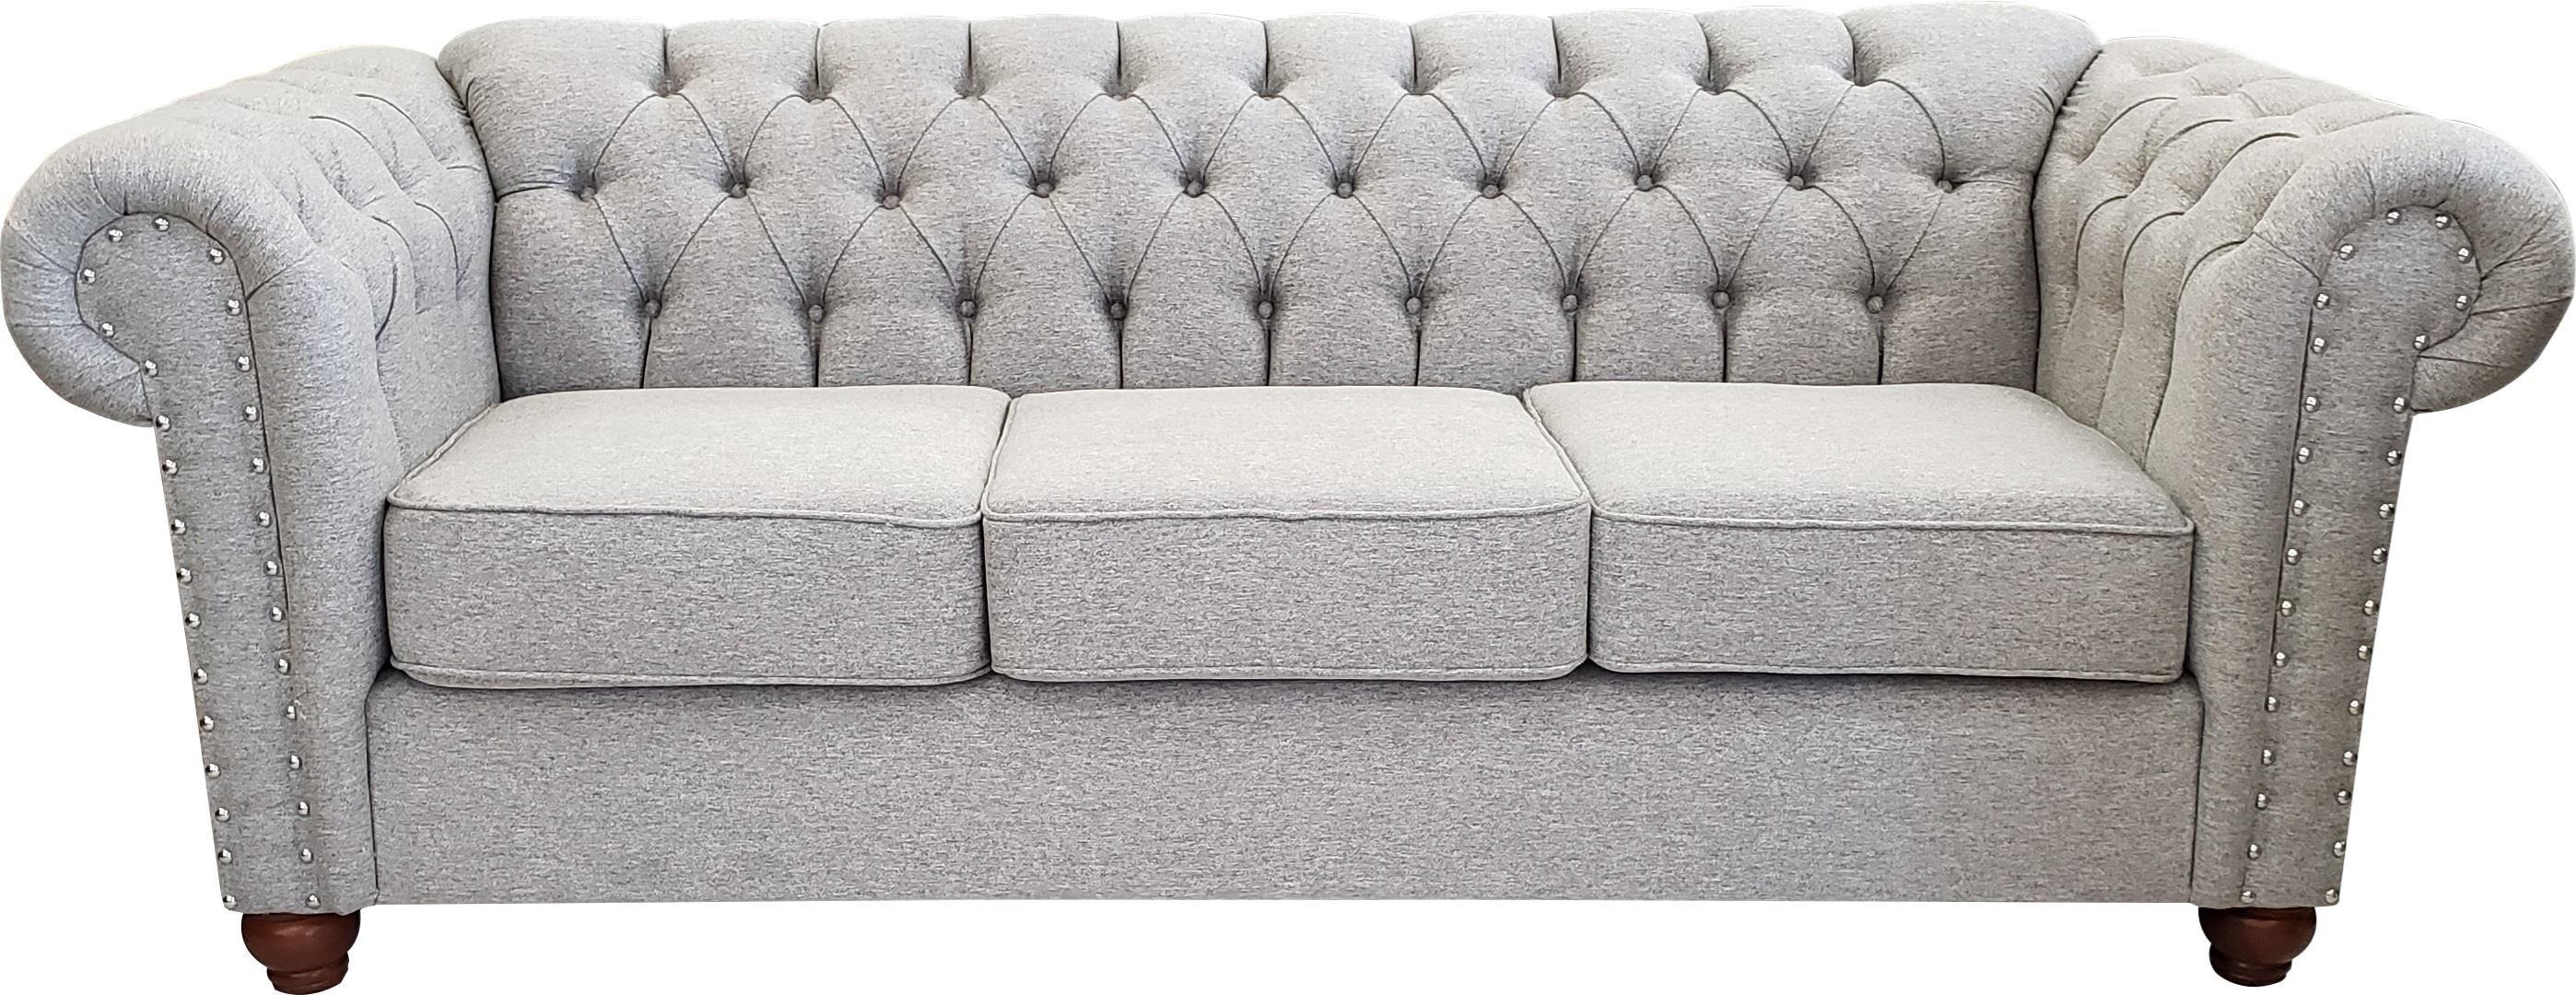 900 Sofa by Phoenix Custom Furniture at Del Sol Furniture